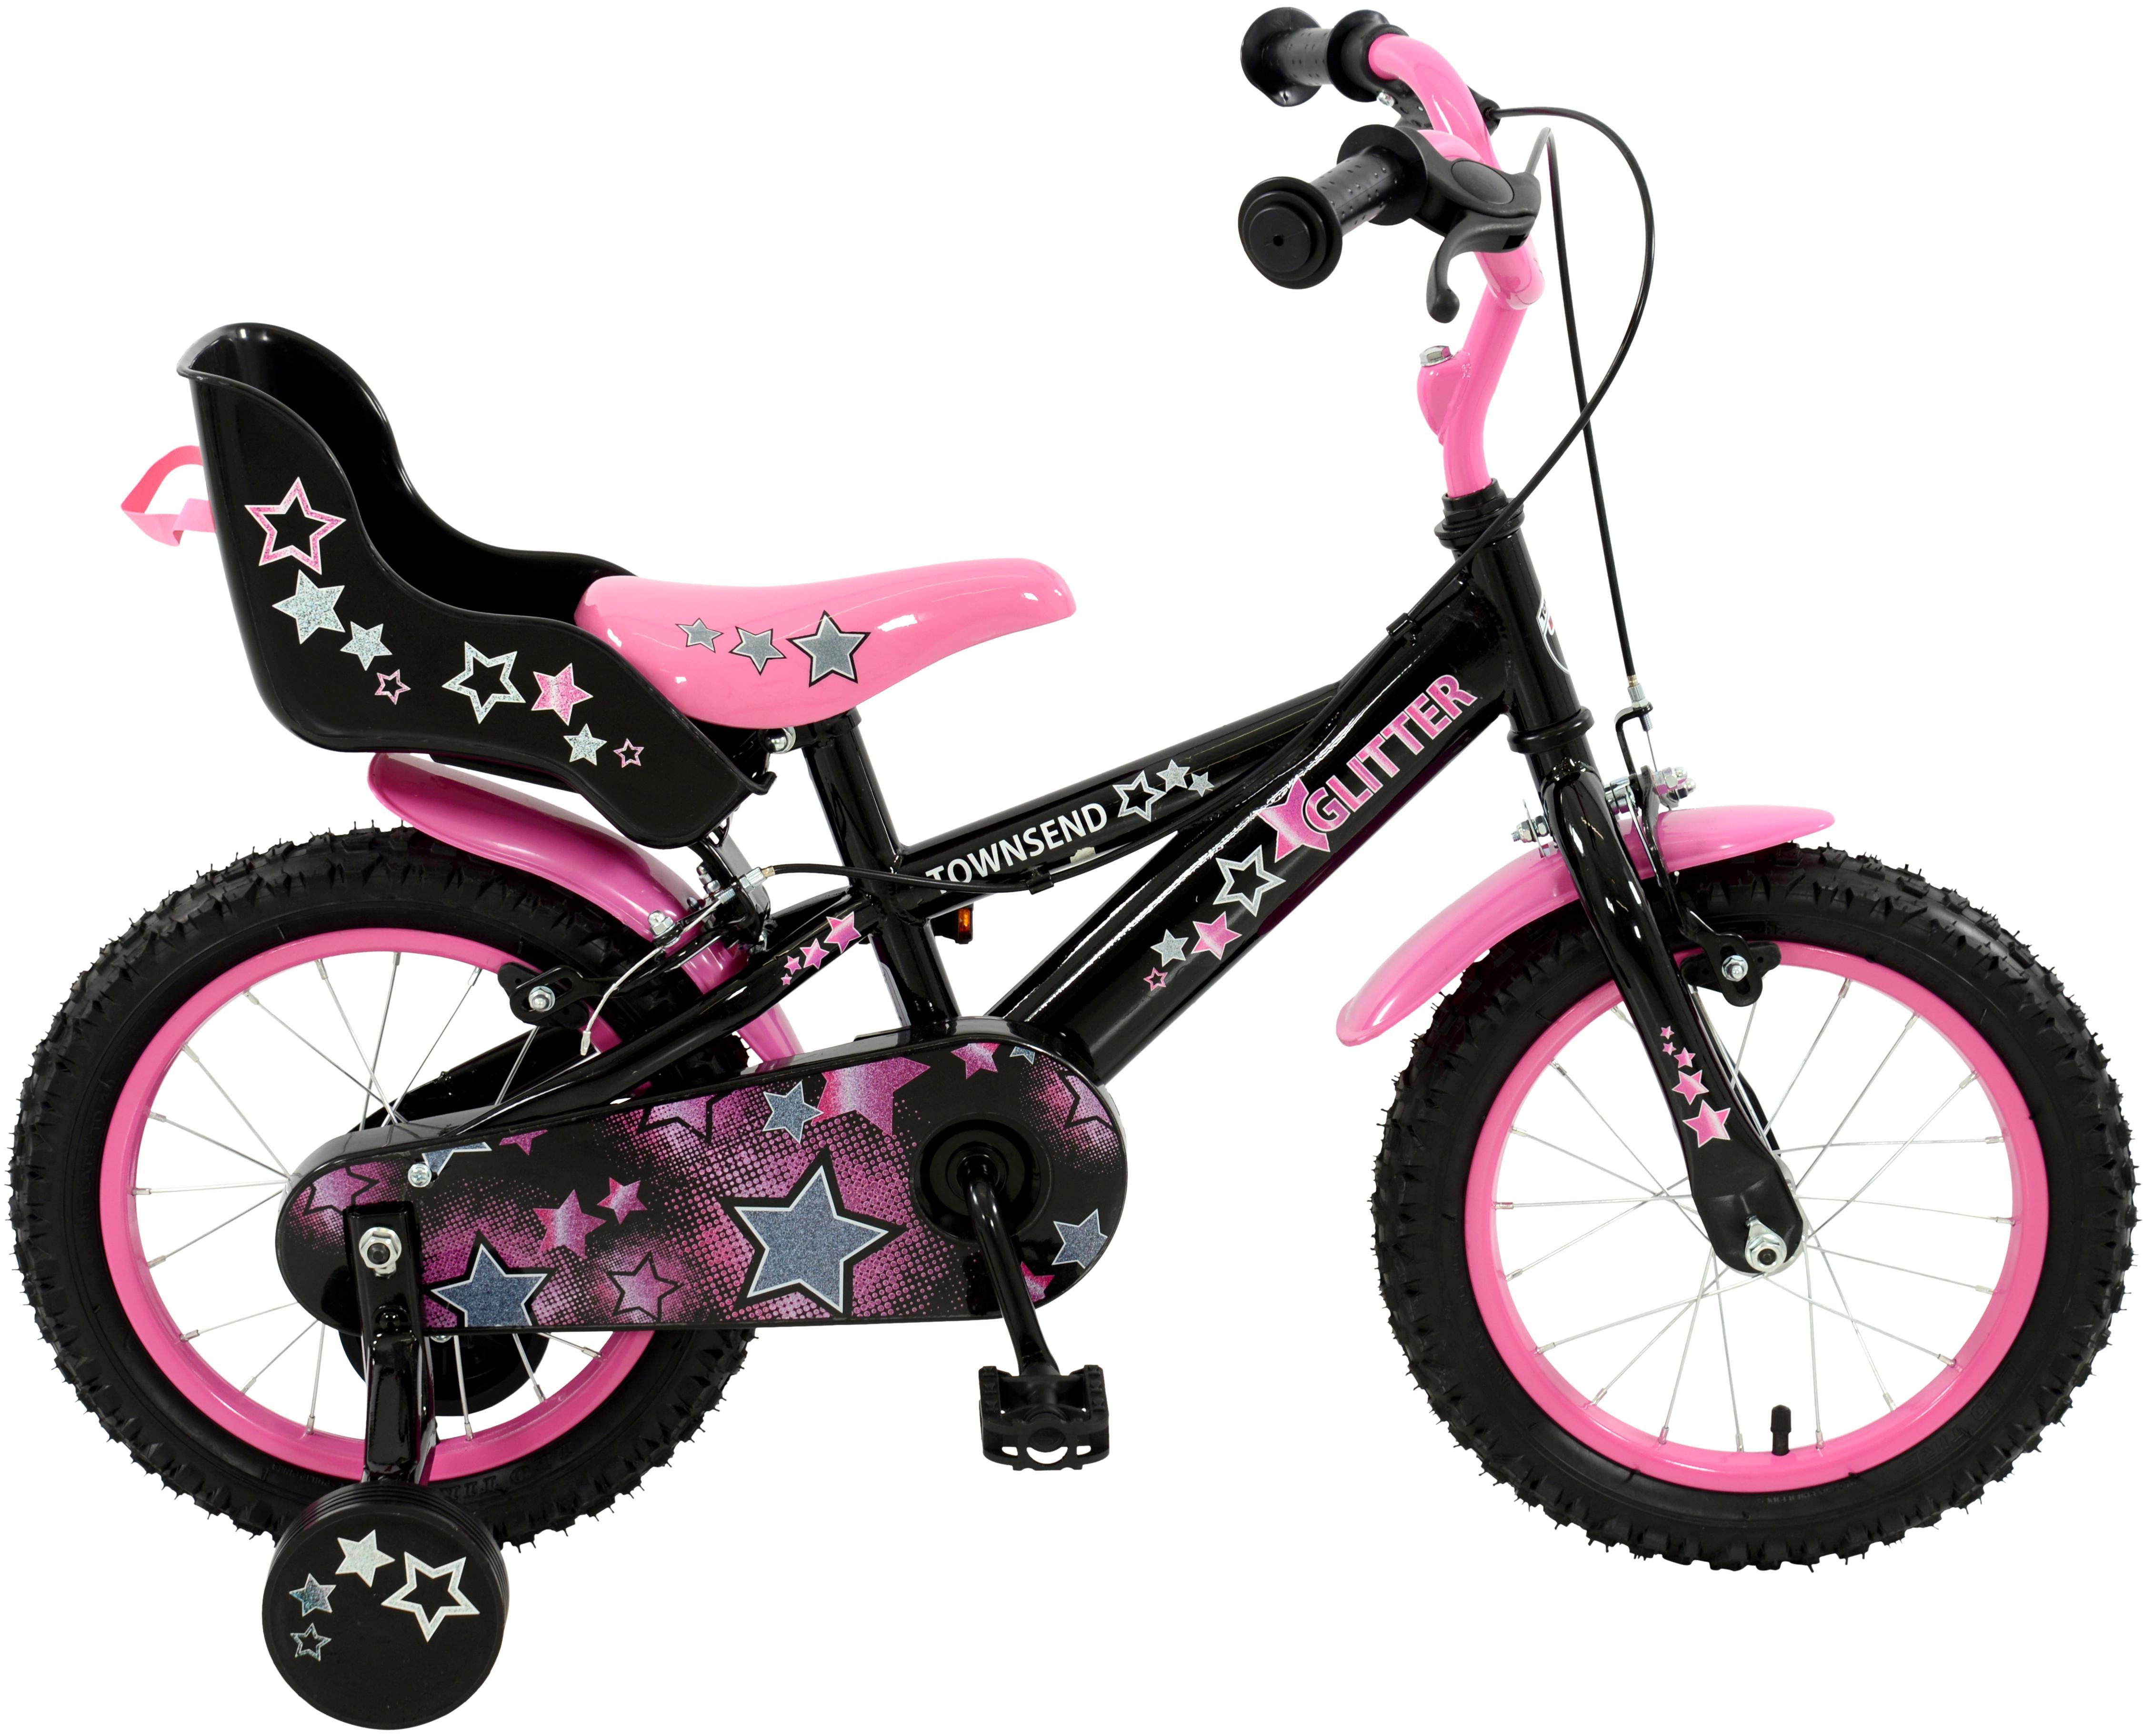 Townsend Glitter Kids Bike - 14 inch Wheel